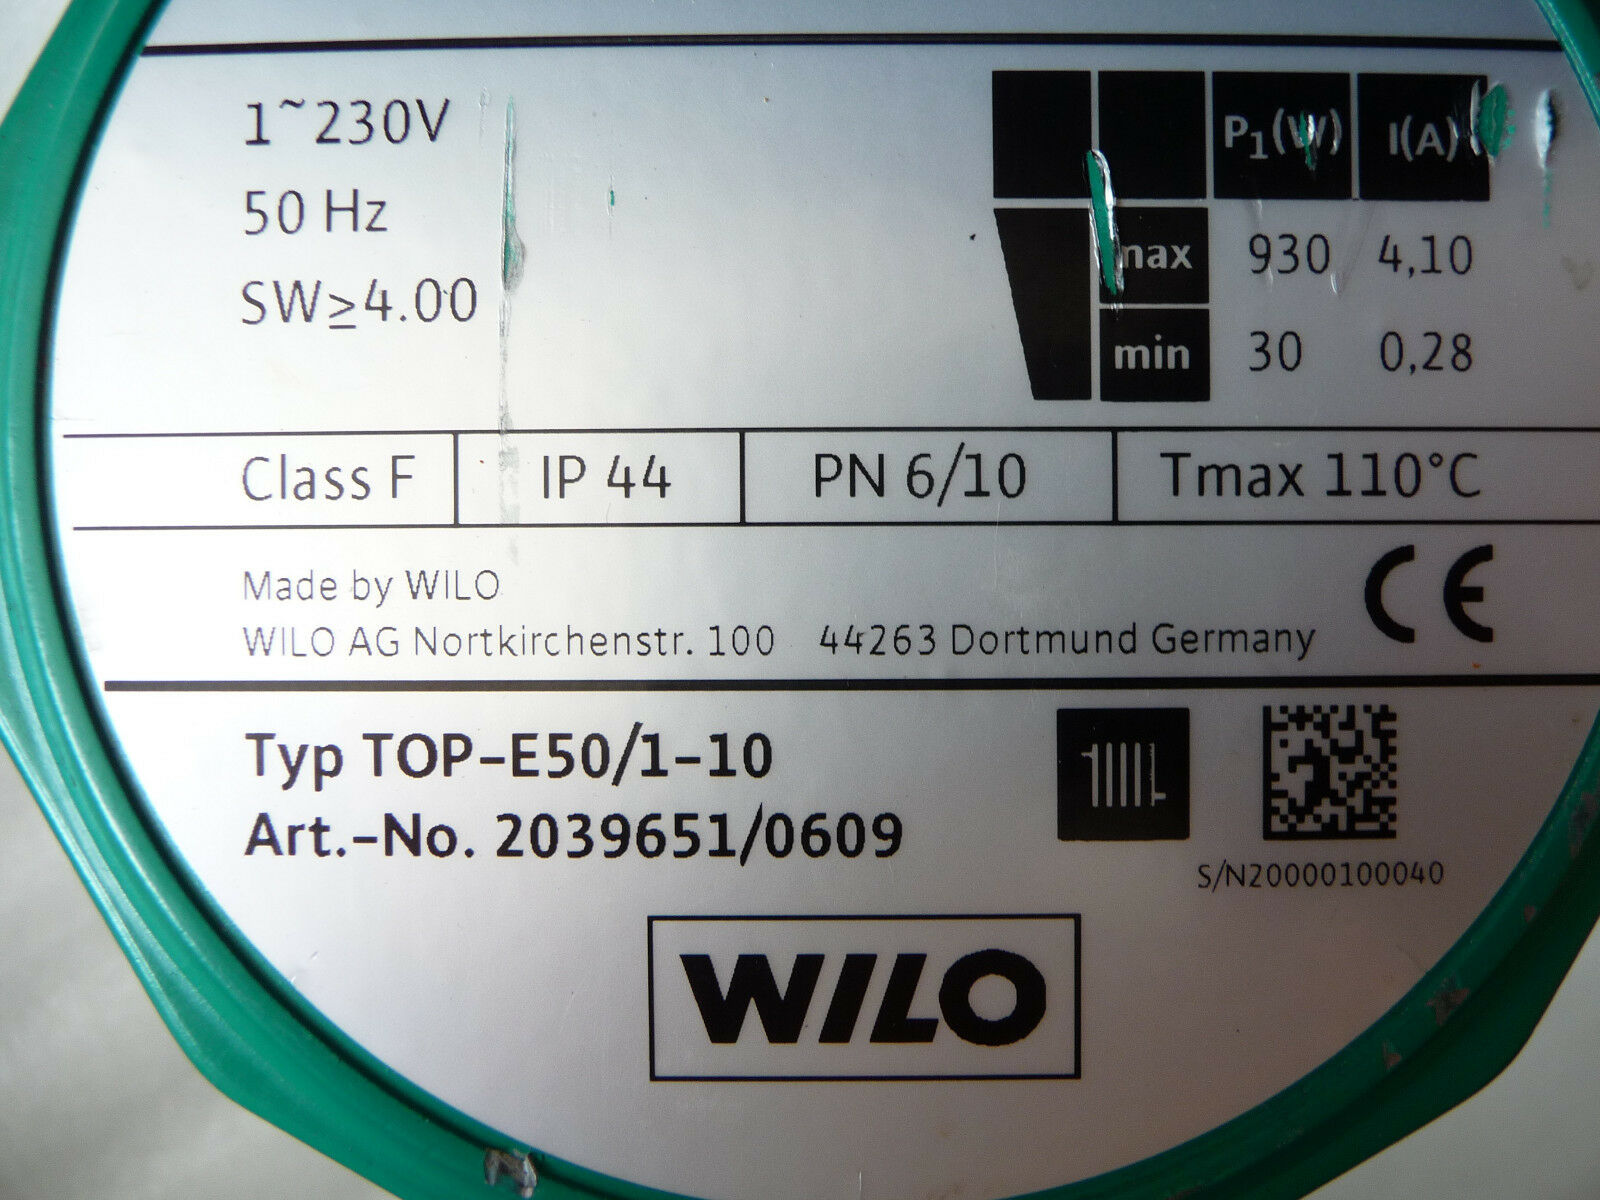 Wilo TOP E 50 / 1 - 10 Heizungspumpe 230 Volt 2039651 280 mm gebraucht P3457/18